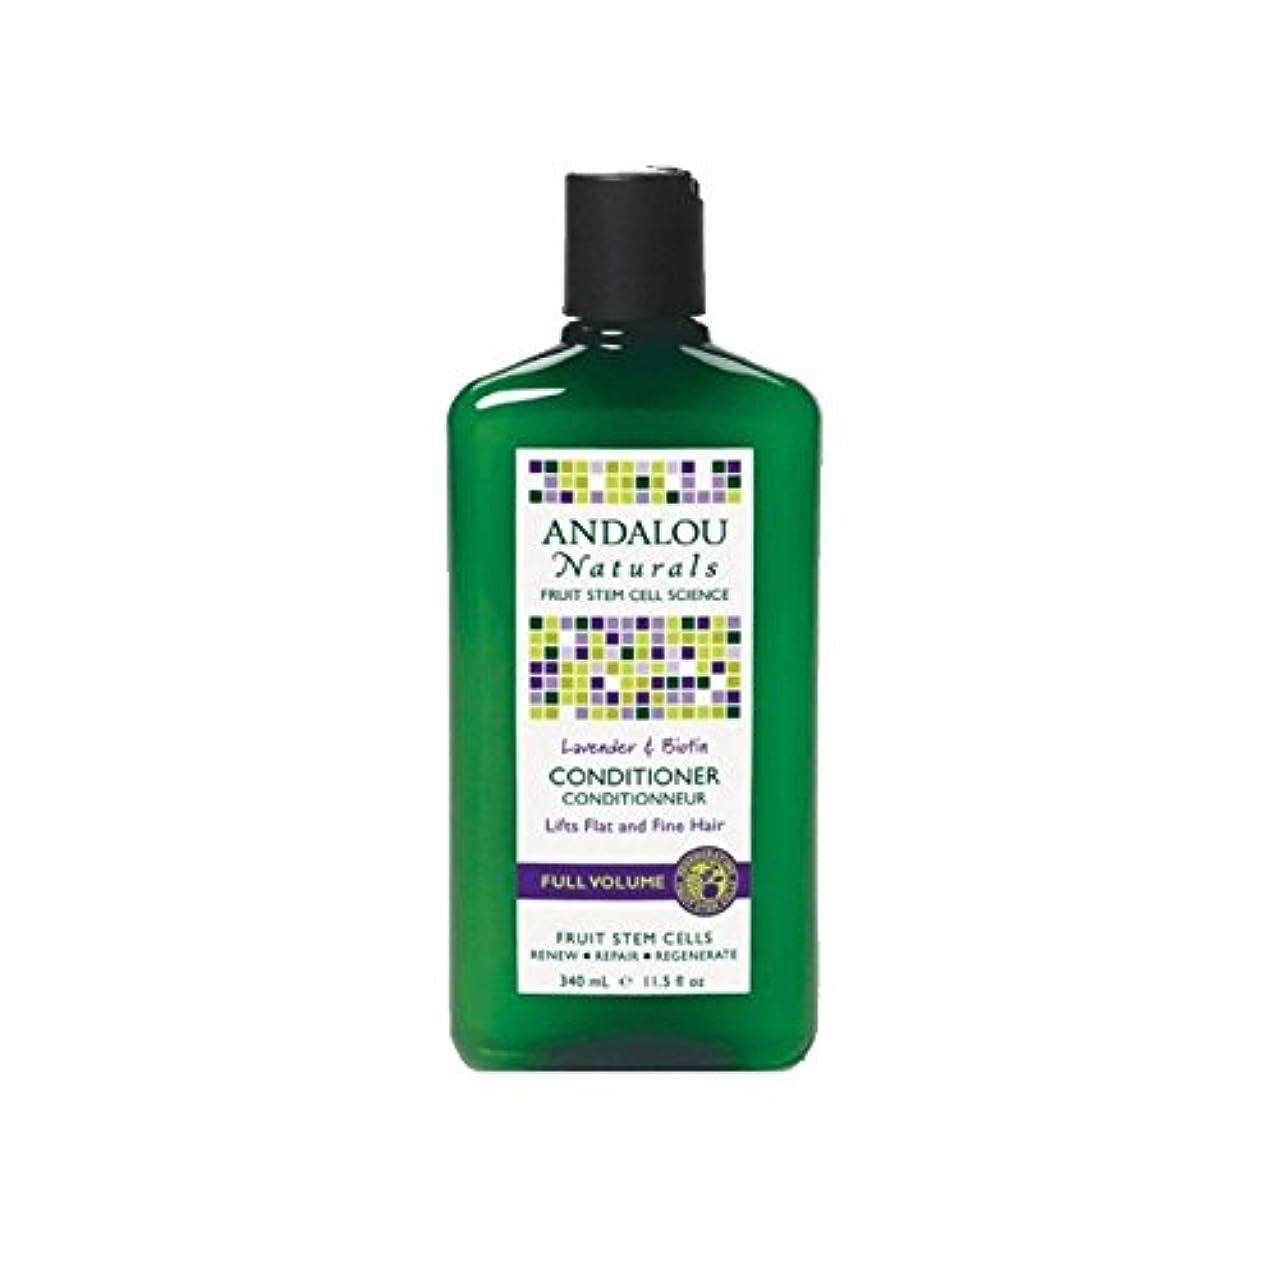 Andalou Lavender & Biotin Full Volume Conditioner 340ml (Pack of 2) - アンダロウラベンダー&ビオチンフルボリュームコンディショナー340ミリリットル...